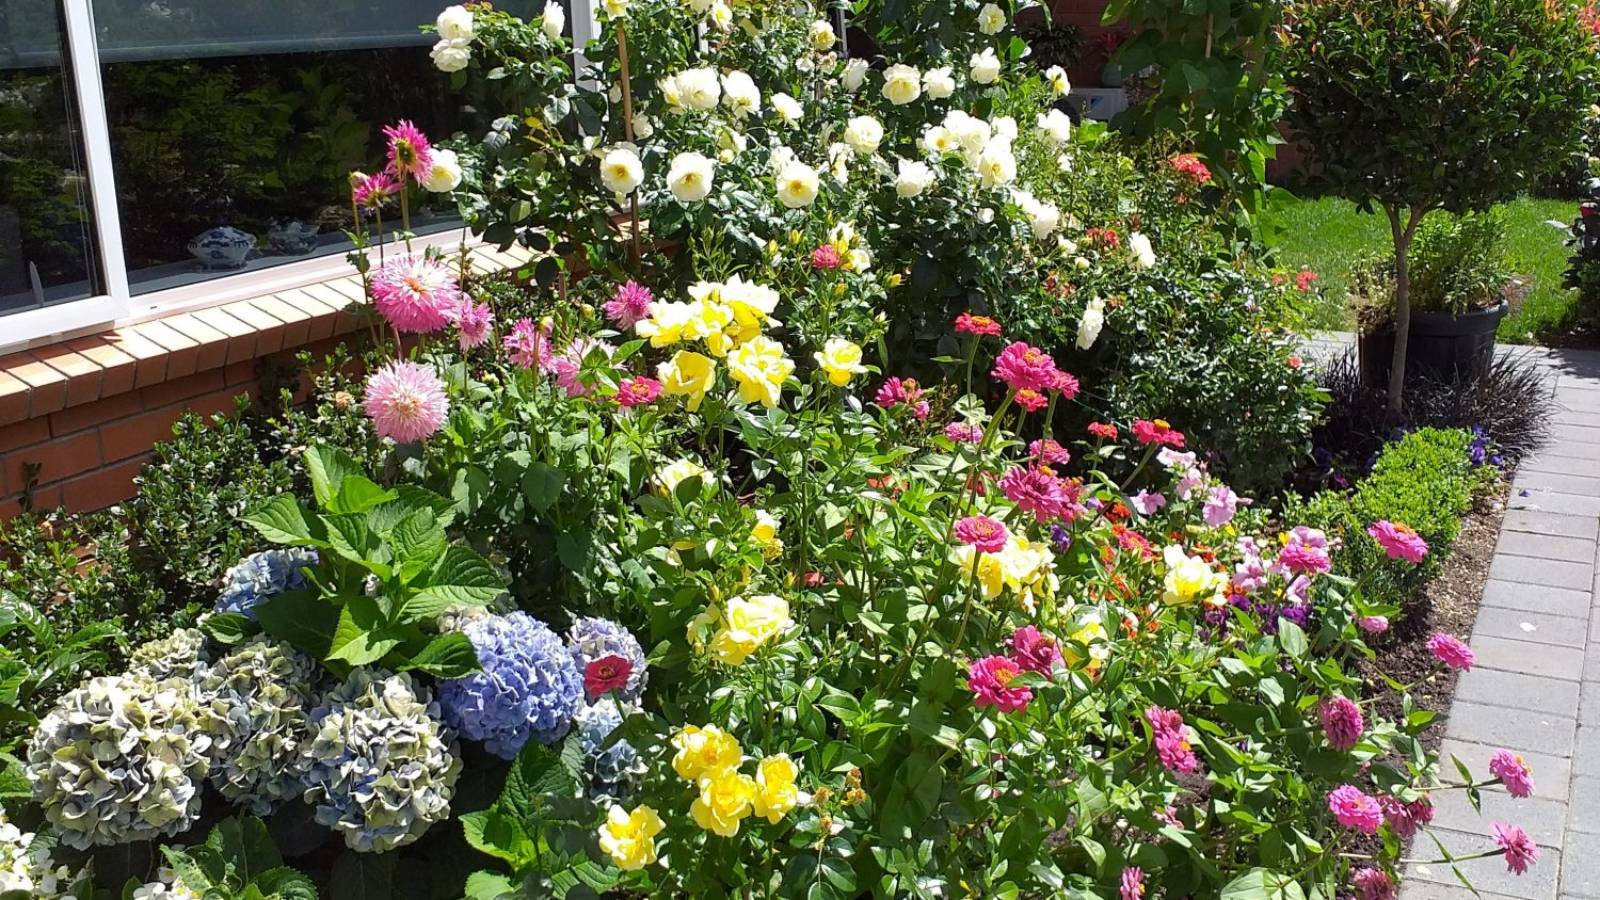 The world's your garden